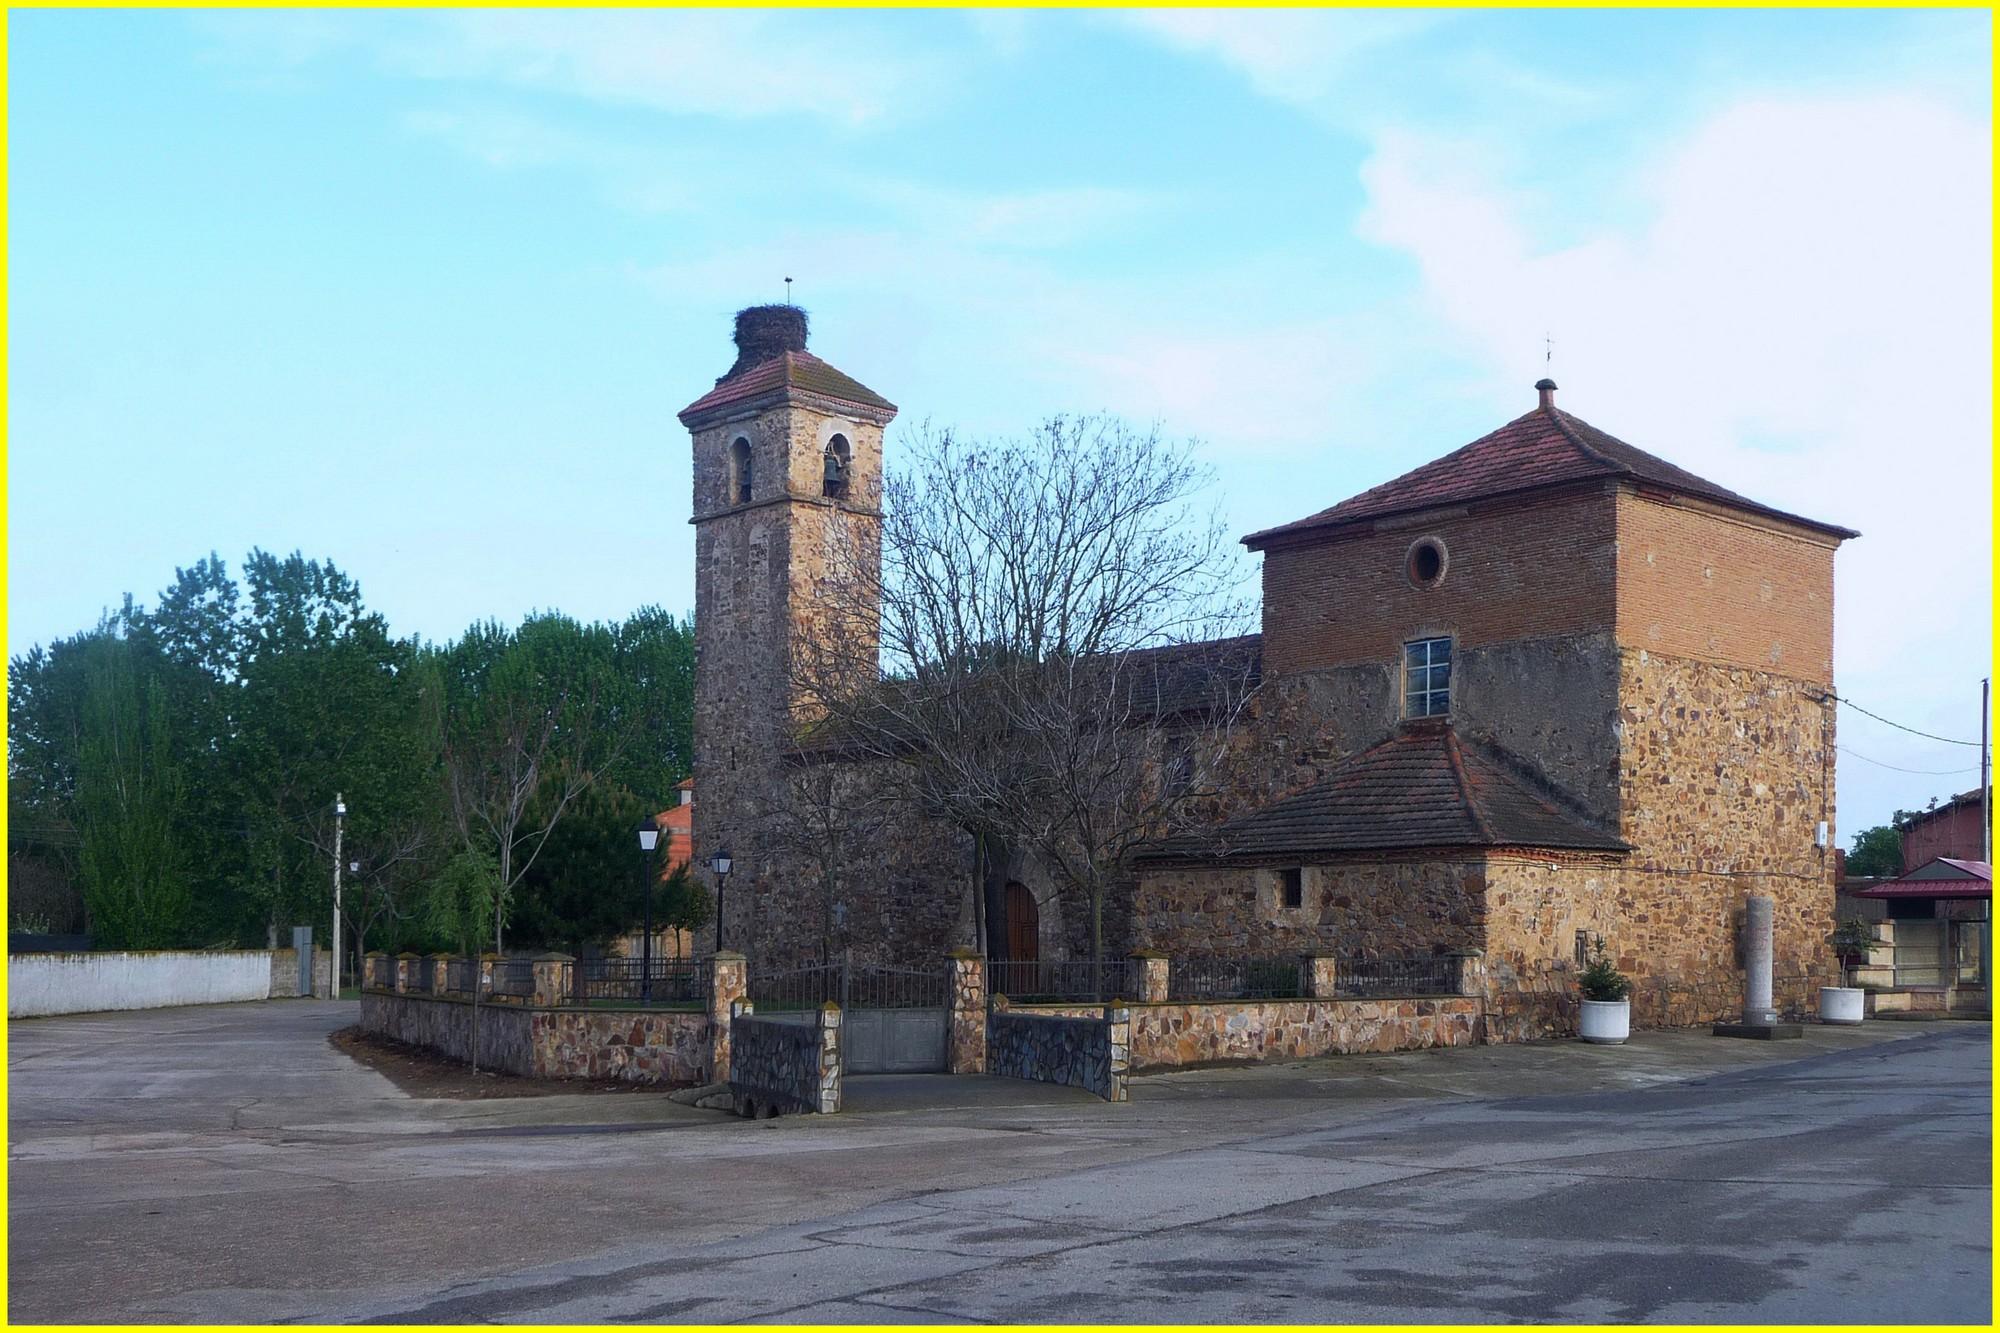 L'église de Villabrazaro entre Benavente et Alija de Infantado